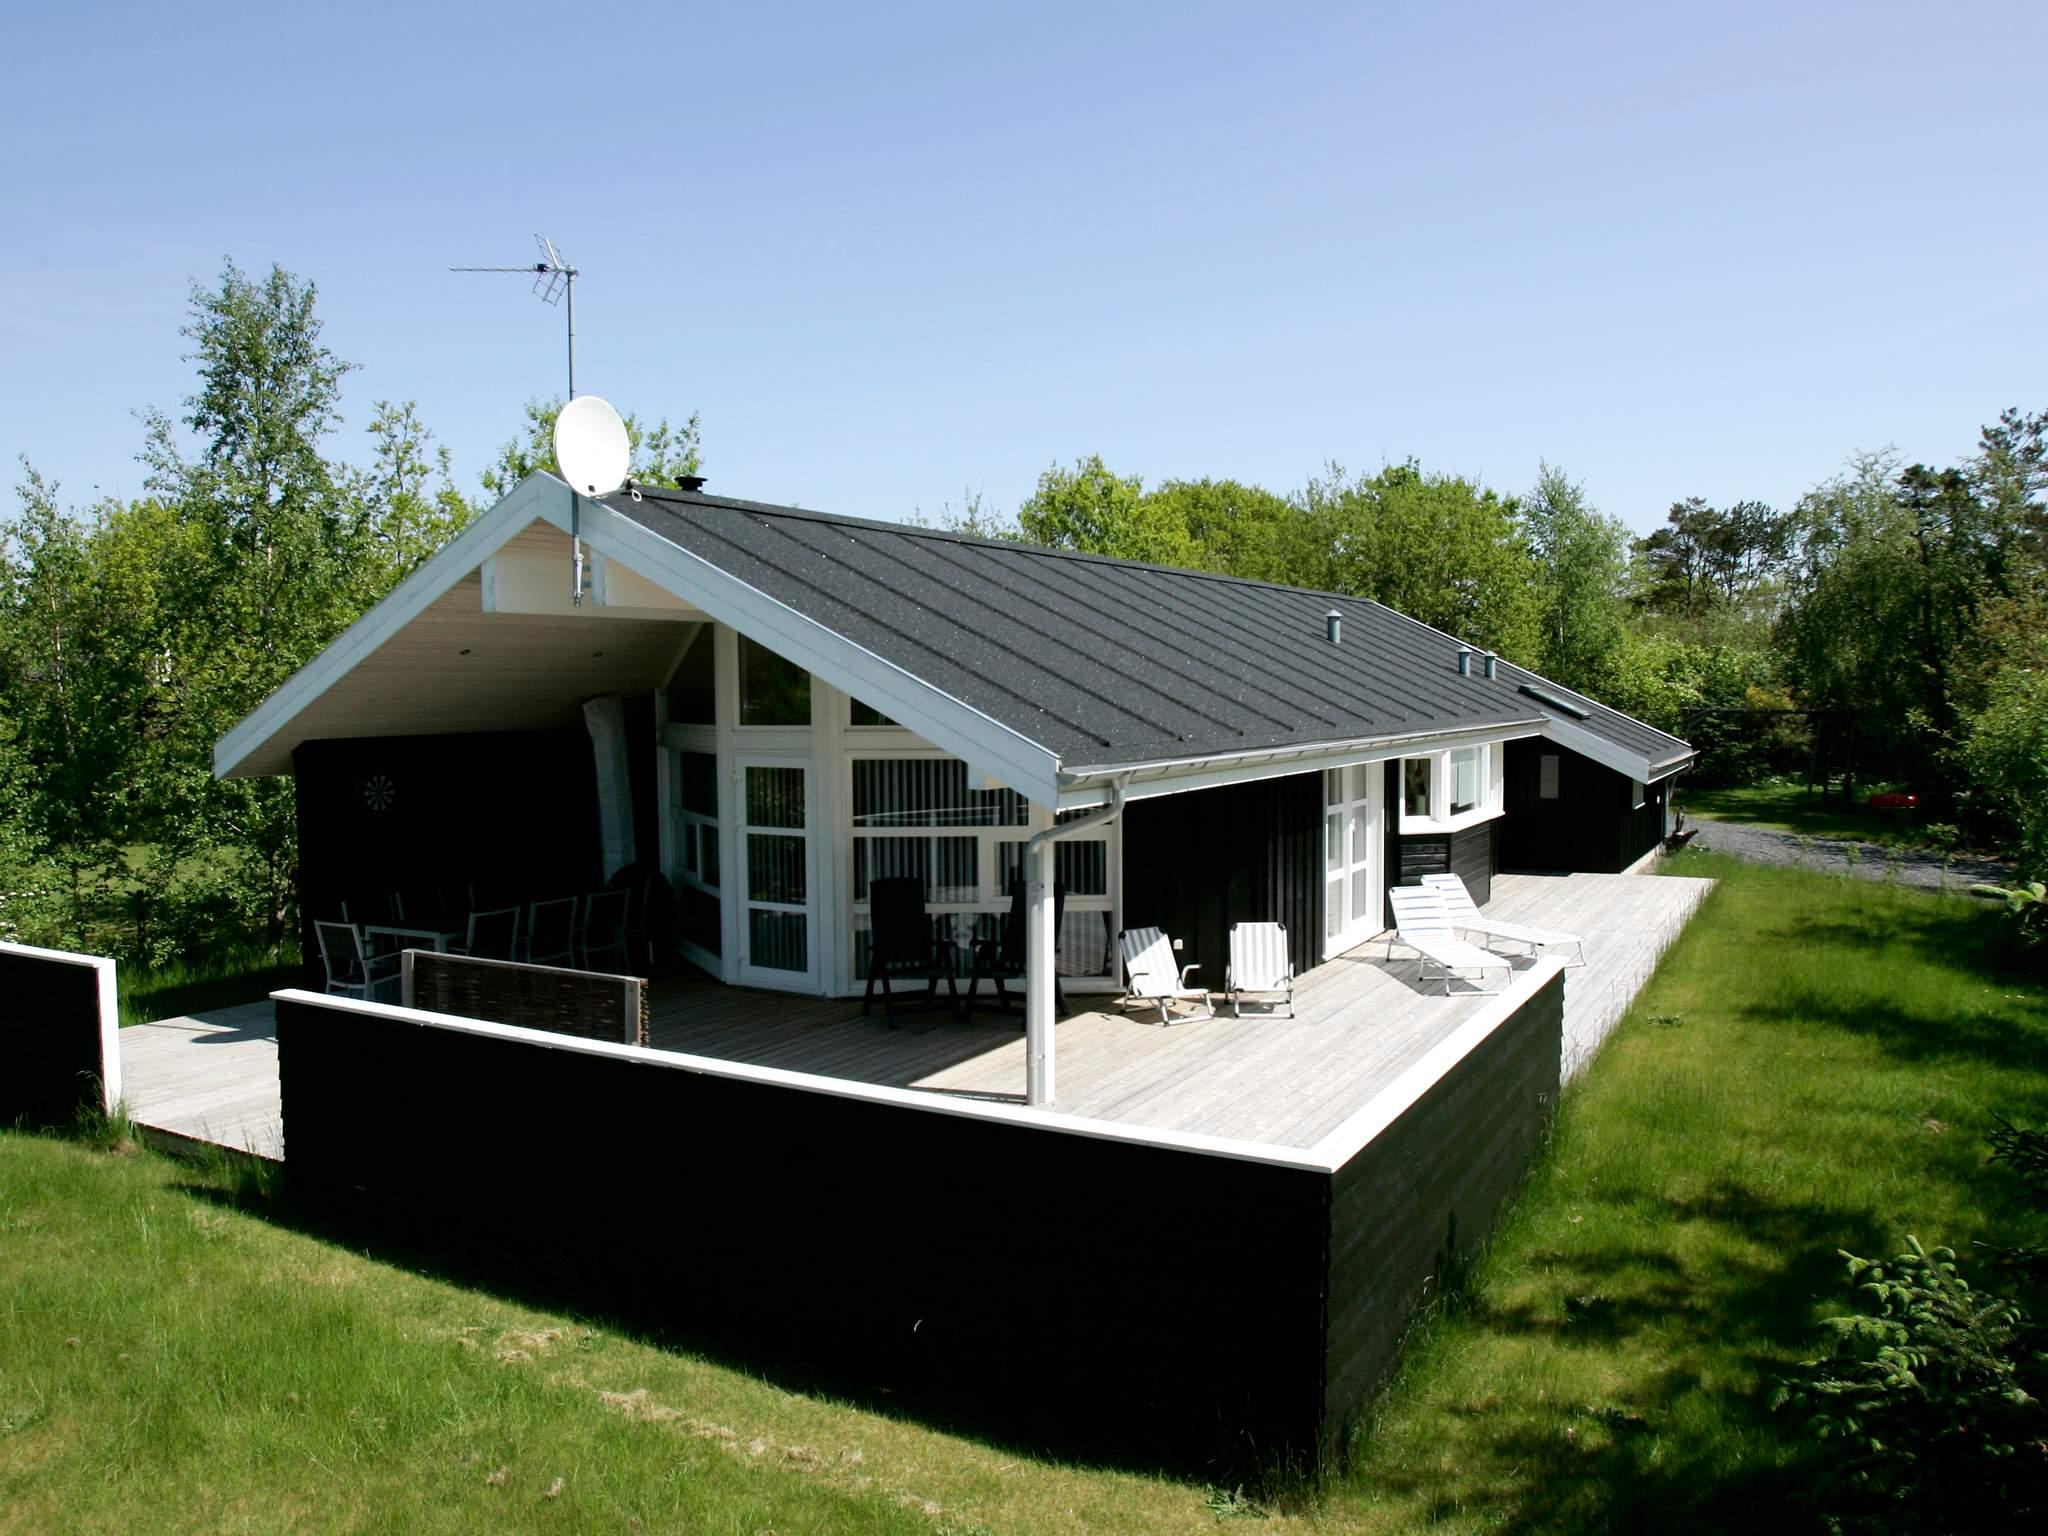 Ferienhaus Øster Hurup (377932), Øster Hurup, , Ostjütland, Dänemark, Bild 1